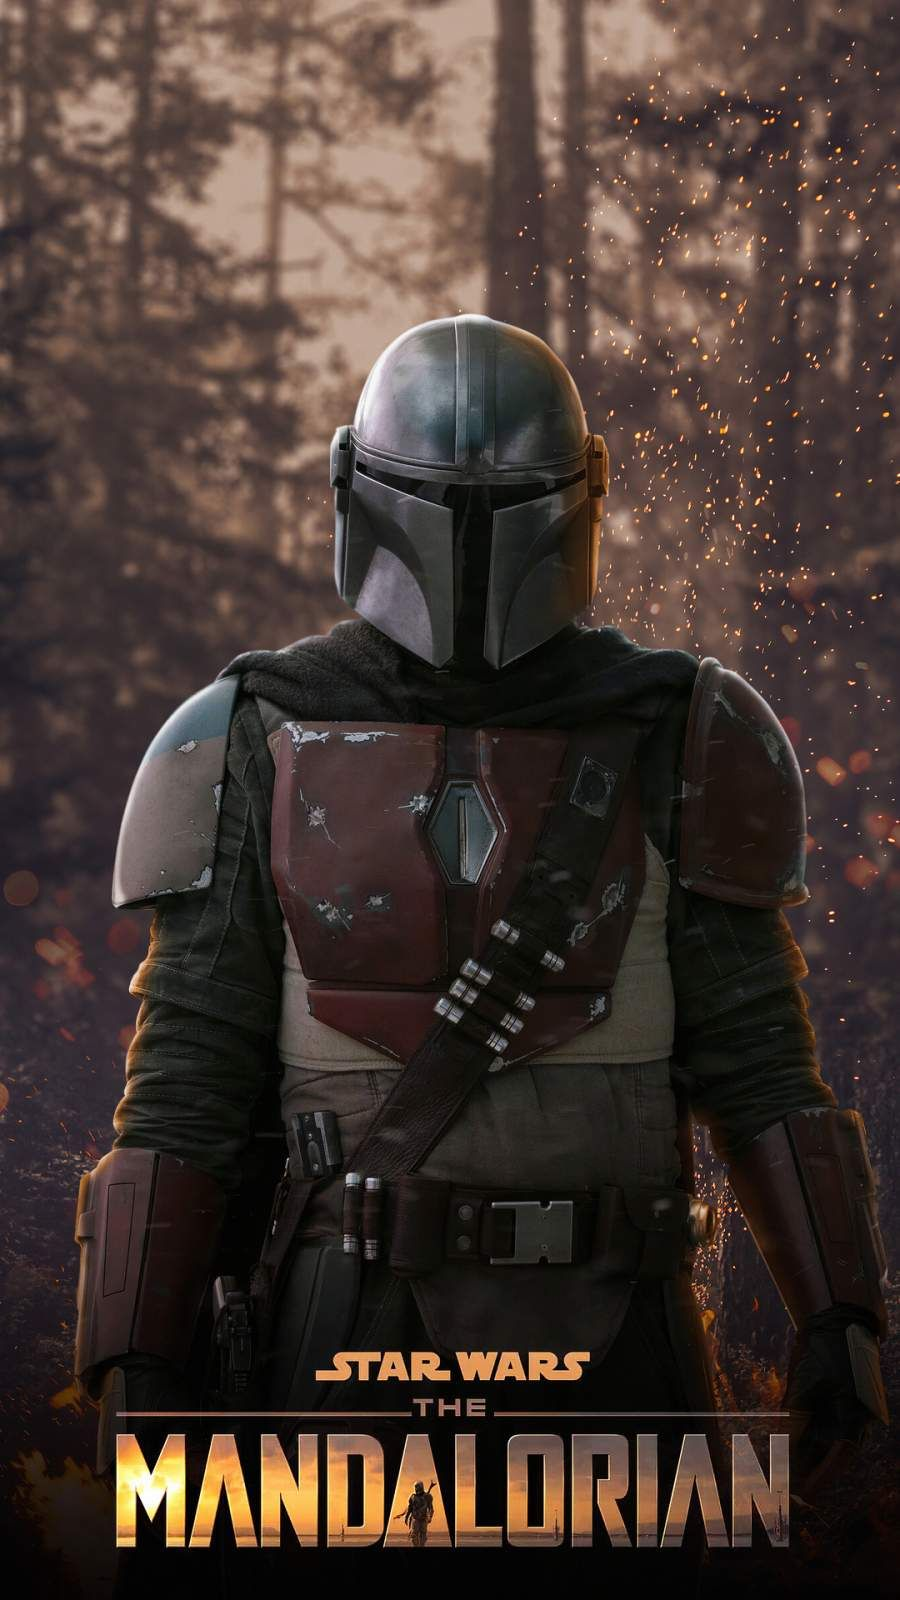 The Mandalorian Iphone Wallpaper In 2020 Star Wars Images Star Wars Poster Star Wars Drawings